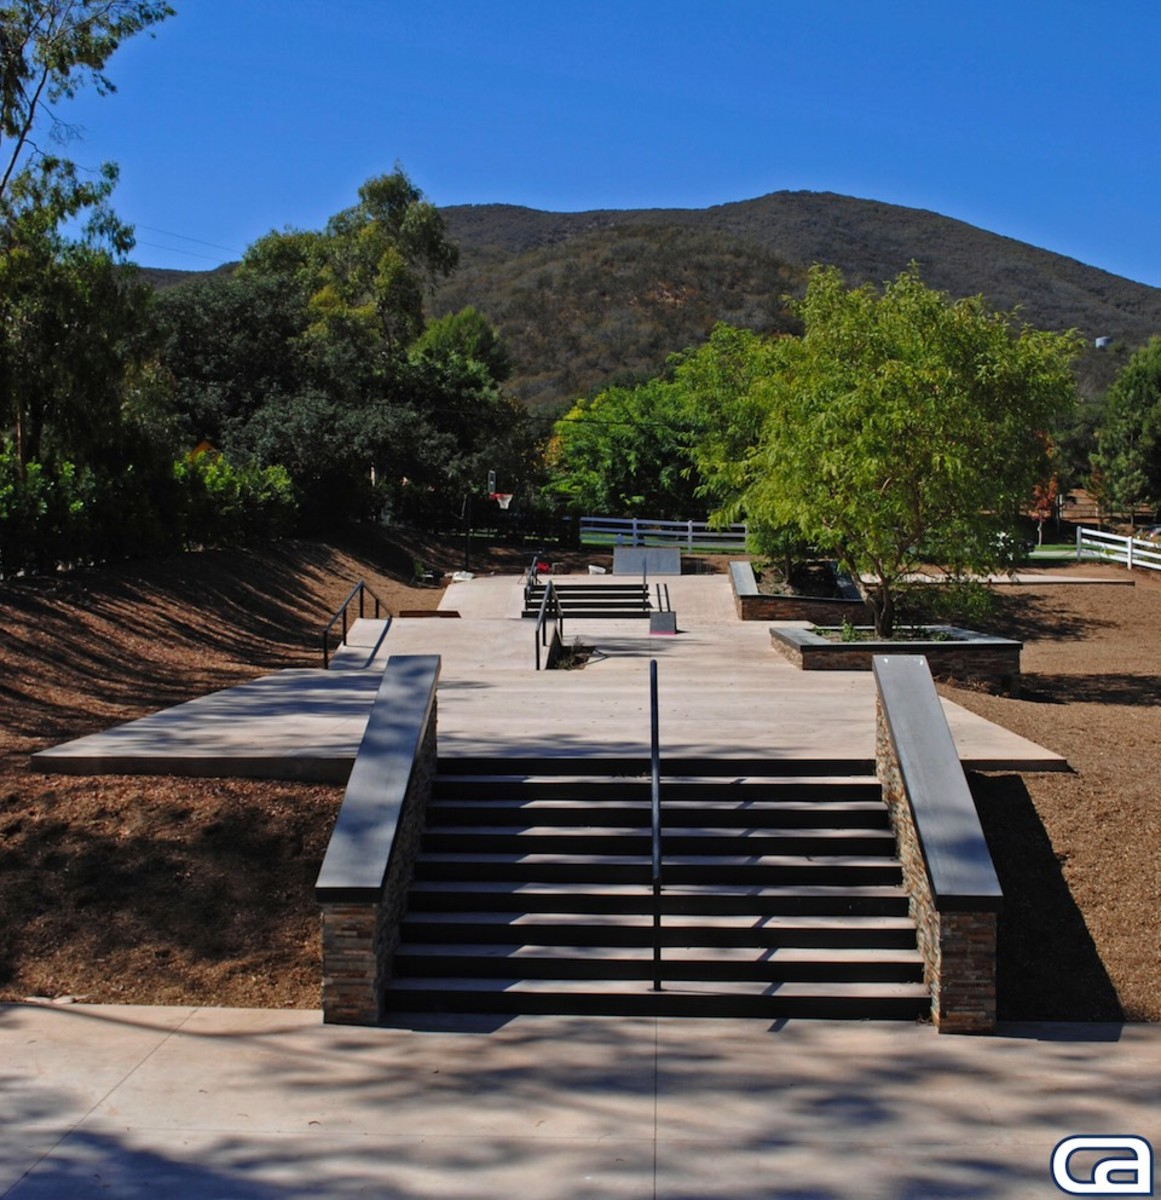 Chris Cole Backyard Skatepark